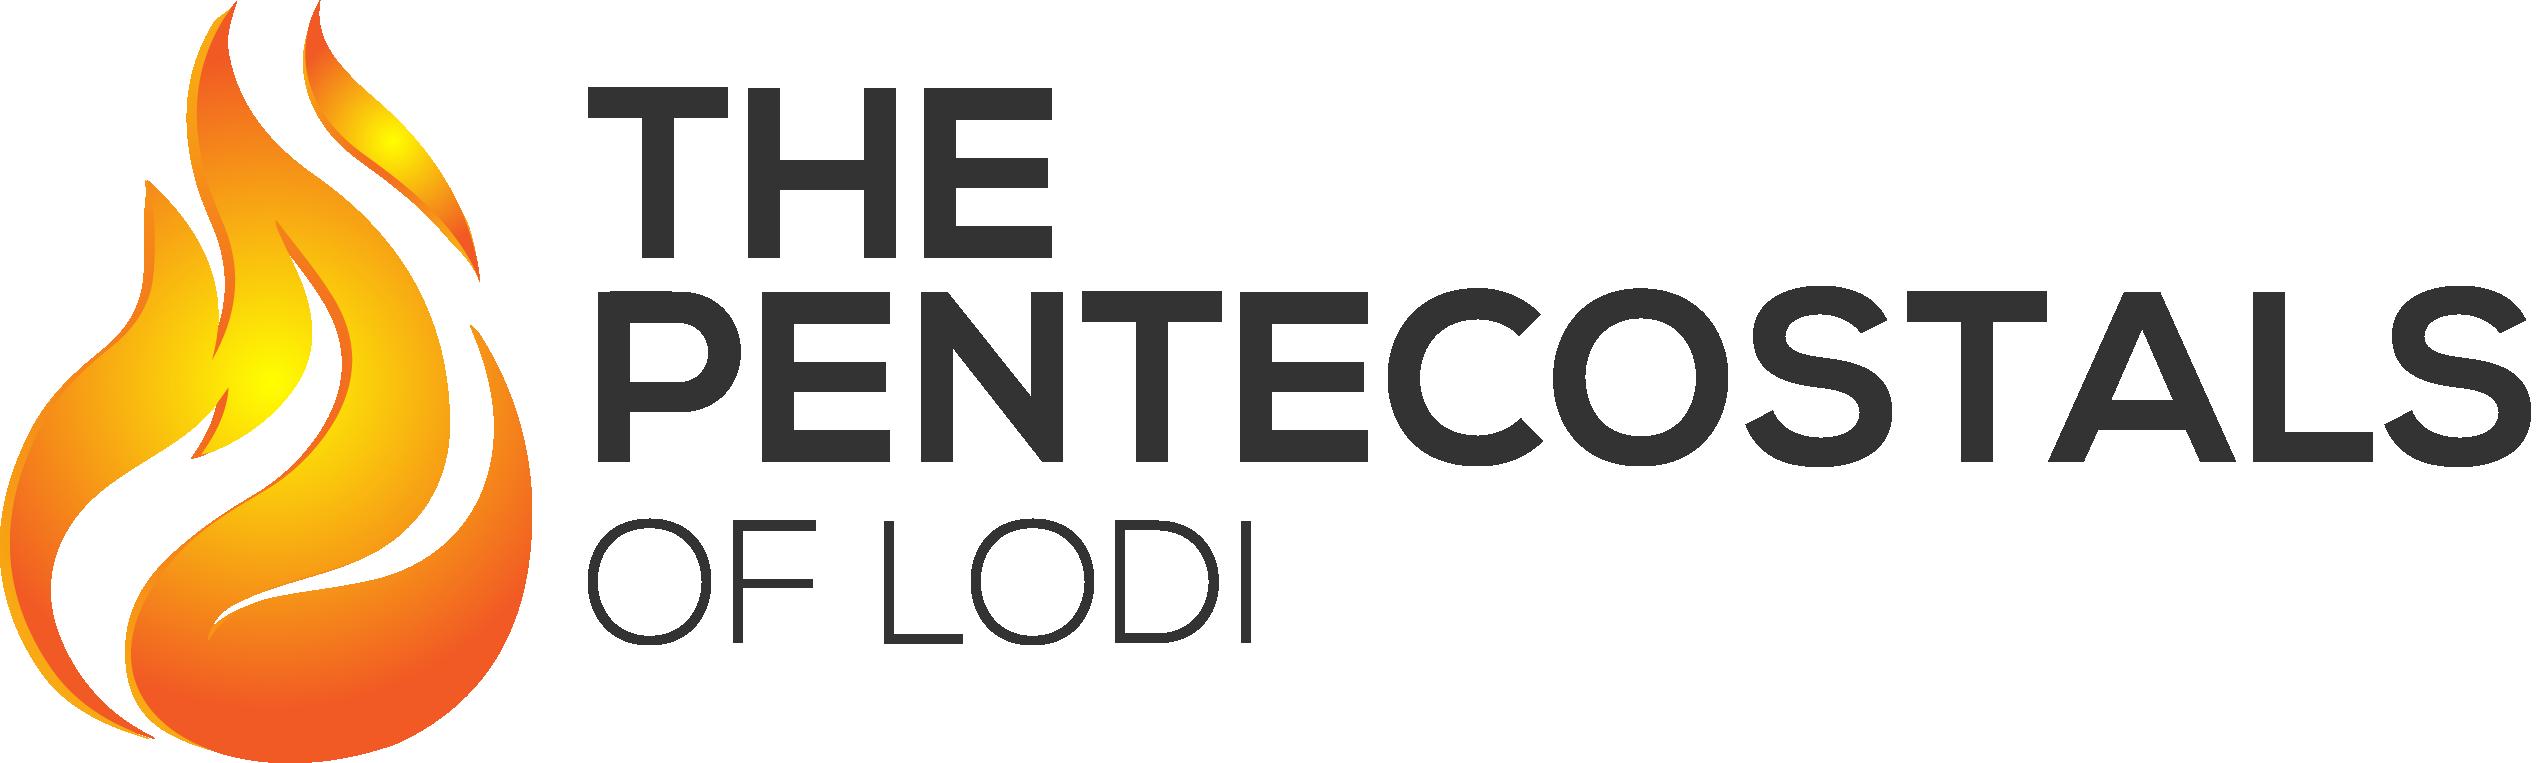 The Pentecostals of Lodi – An Apostolic Pentecostal Church